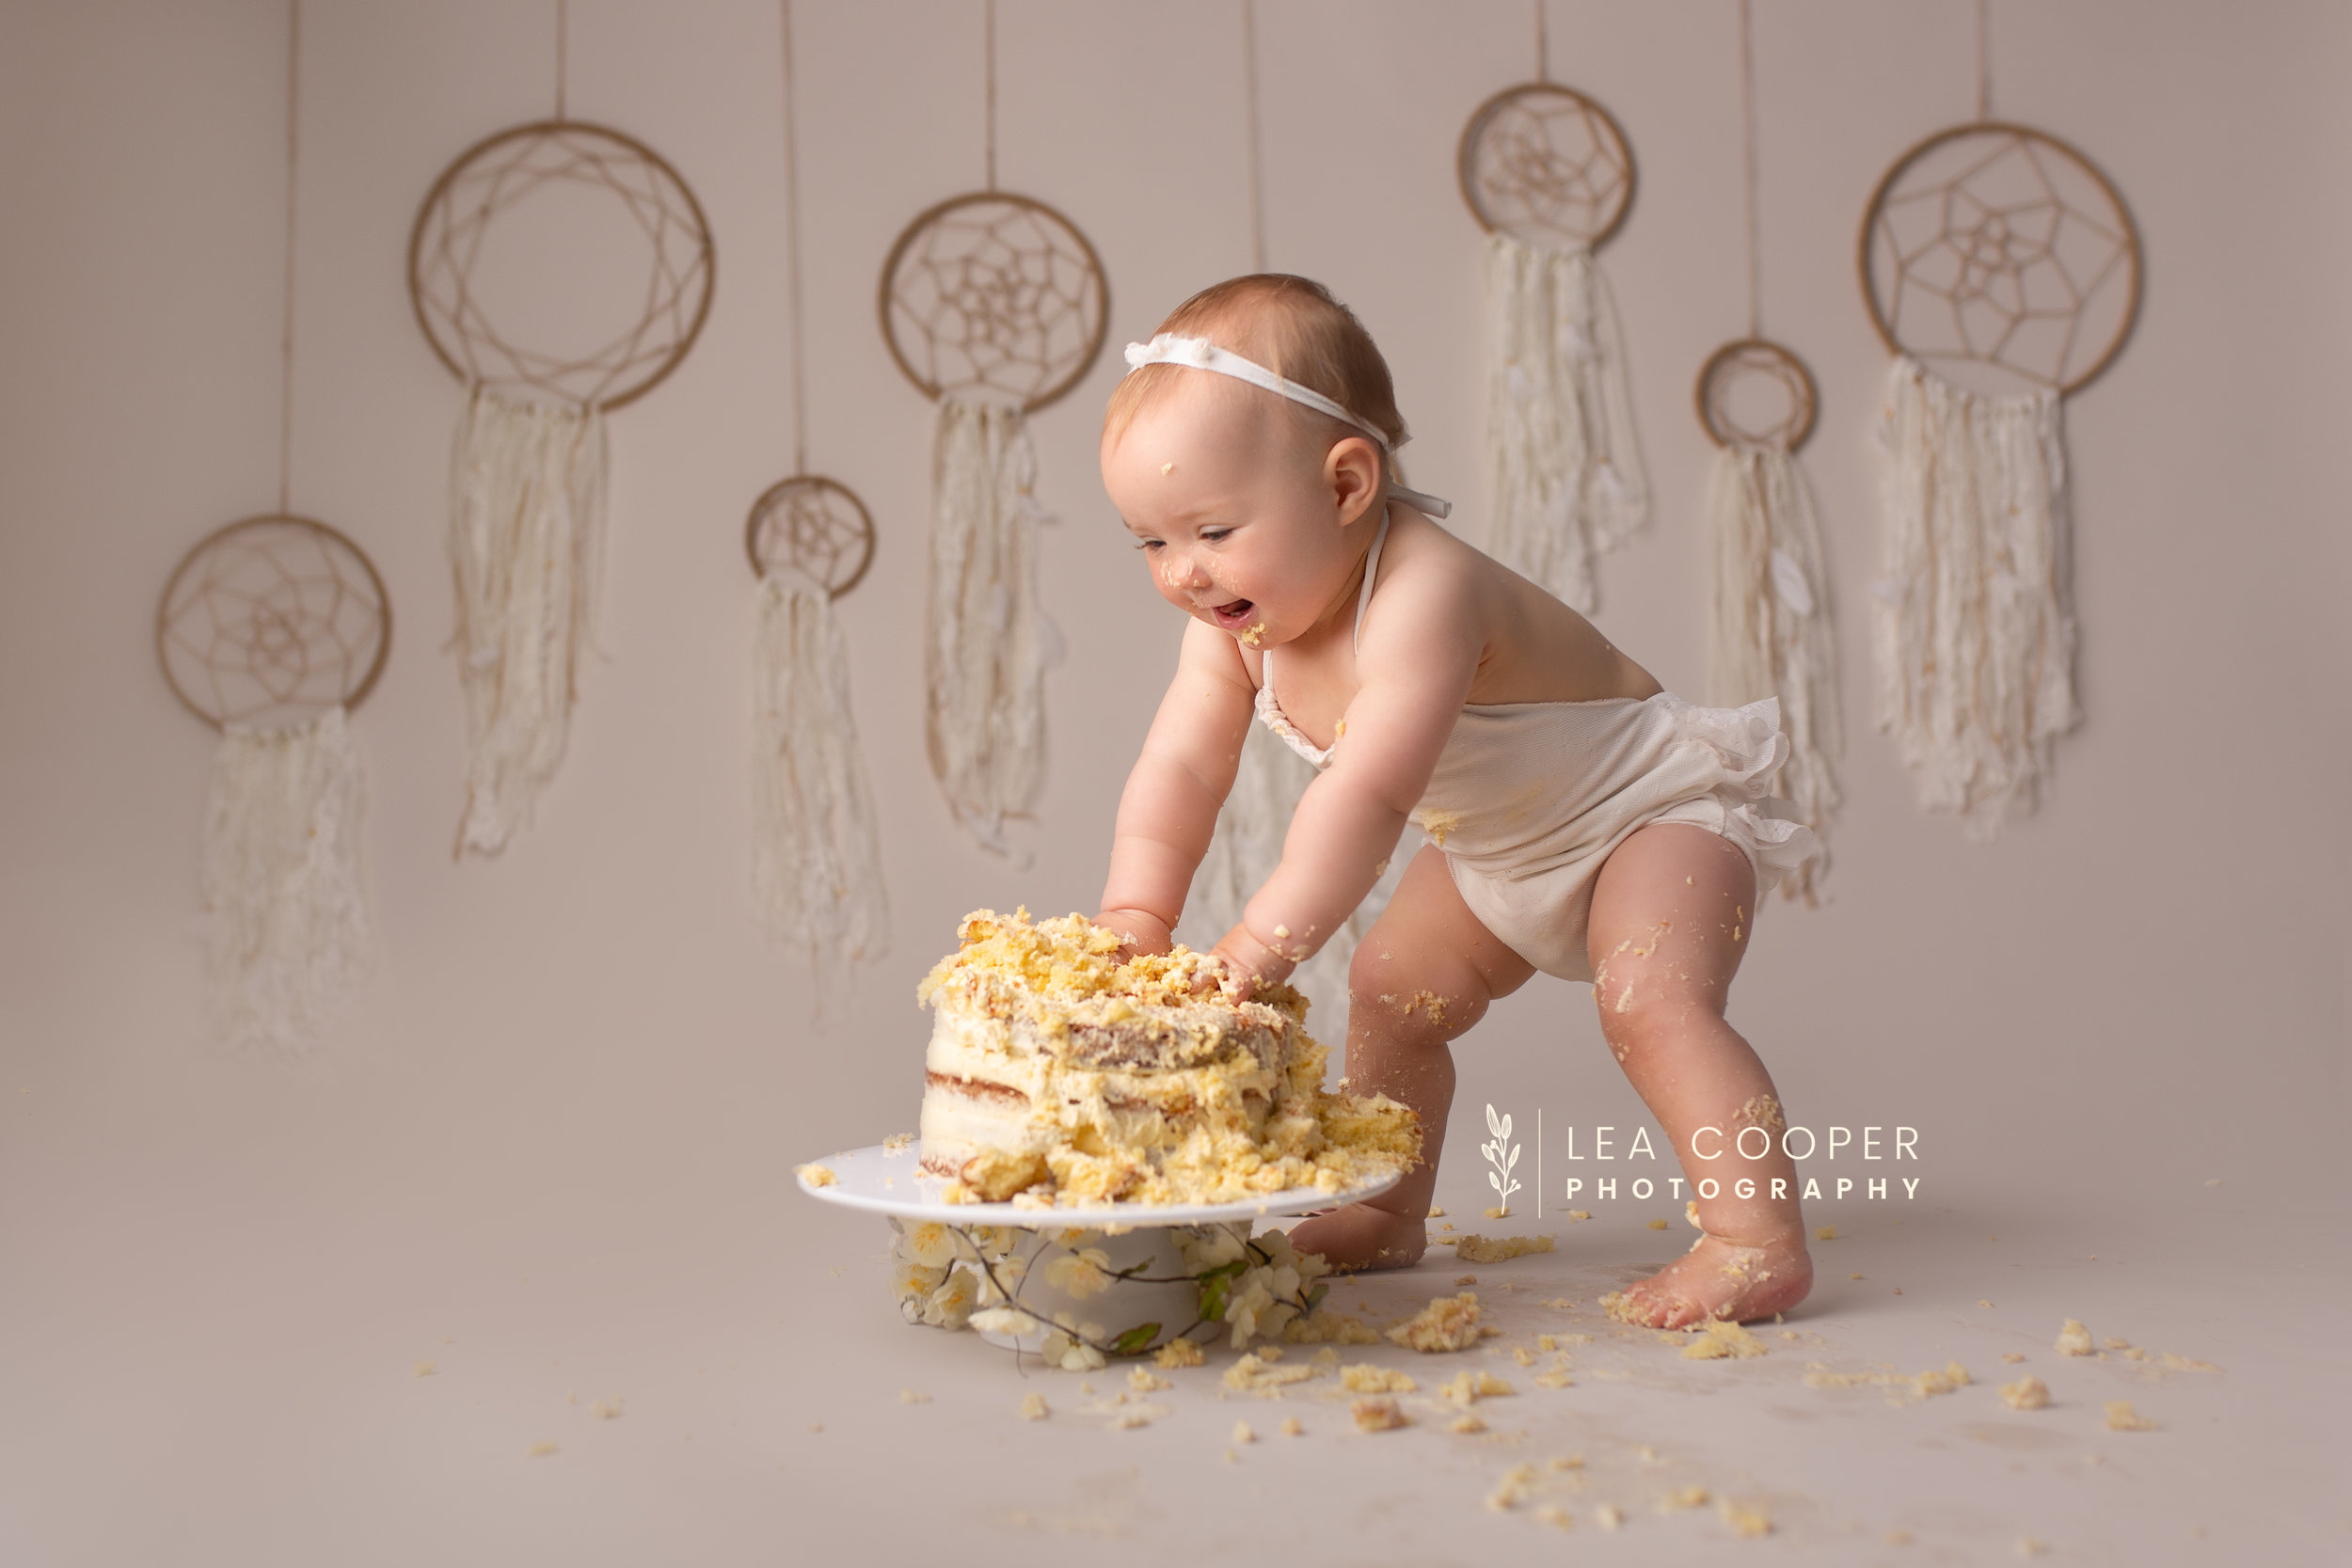 LEA-COOPER-PHOTOGRAPHY-CAKE-SMASH-SESSION-BIRTHDAY-PHOTOS-1ST-BIRTHDAY-SPLASH-SESSION-SMASH-SESSION-CHILDRENS-PHOTOGRAPHY-WILLENHALL-WOLVERHAMPTON-BIRMINGHAM-WEST-MIDLANDS-UK-9.jpg